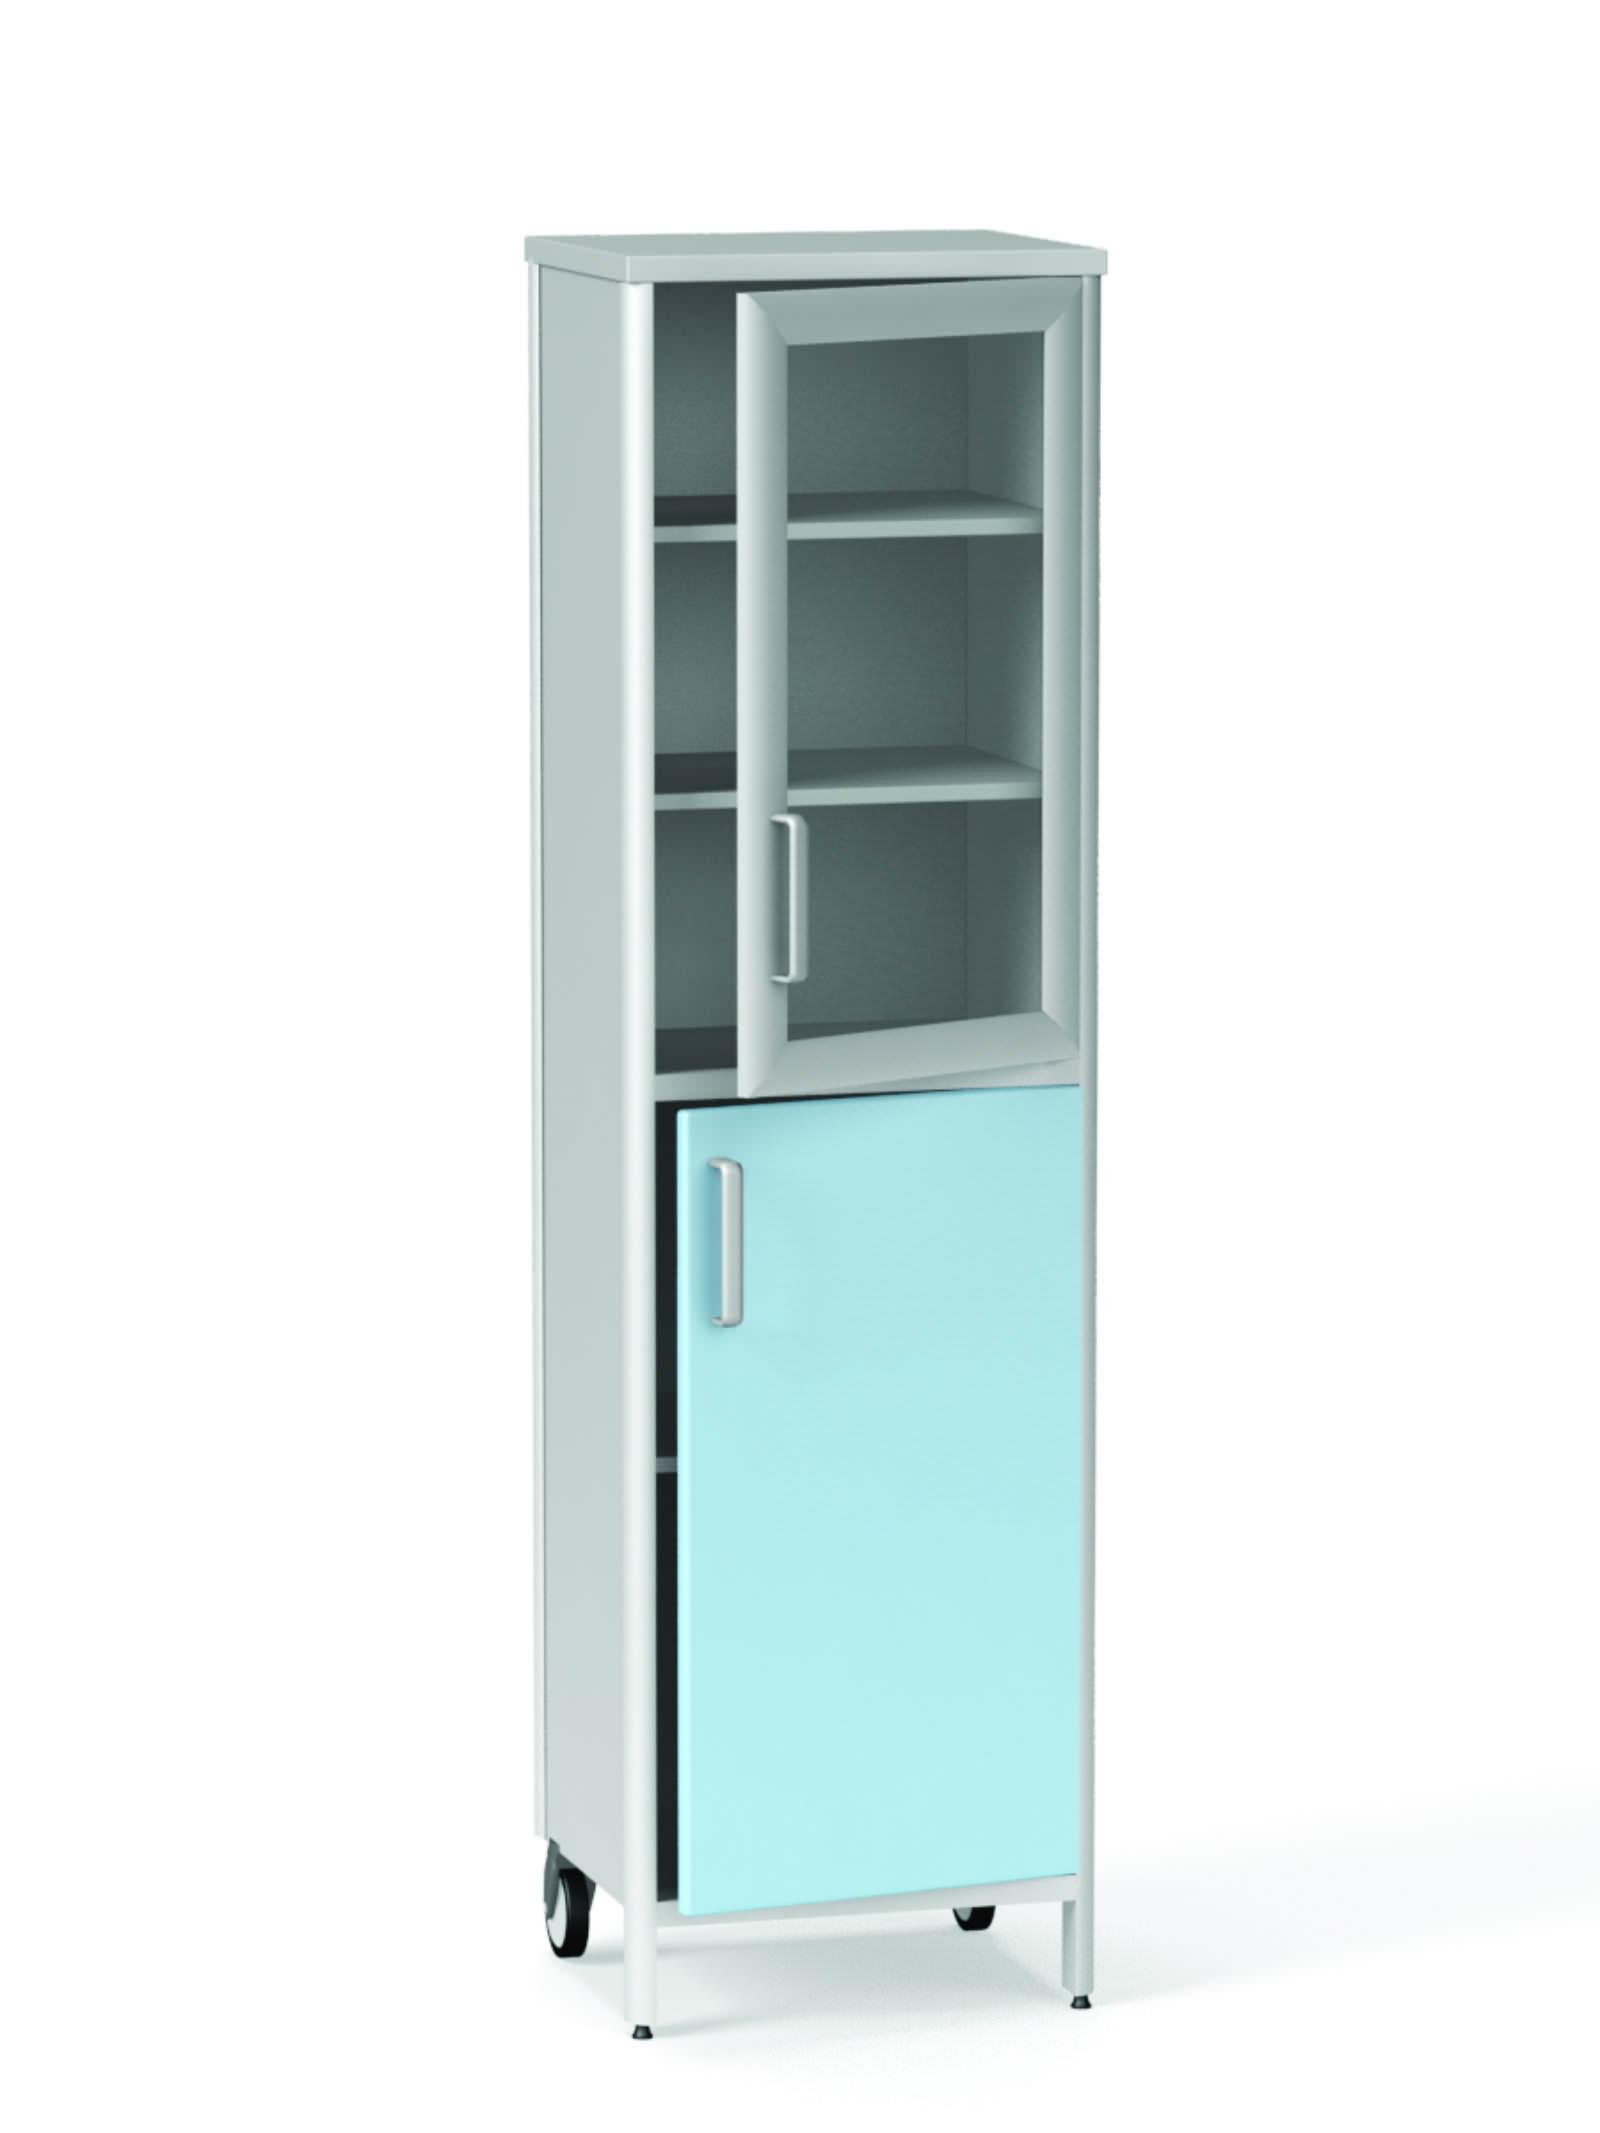 Медицинский шкаф ДМ-3-001-03, фото 2